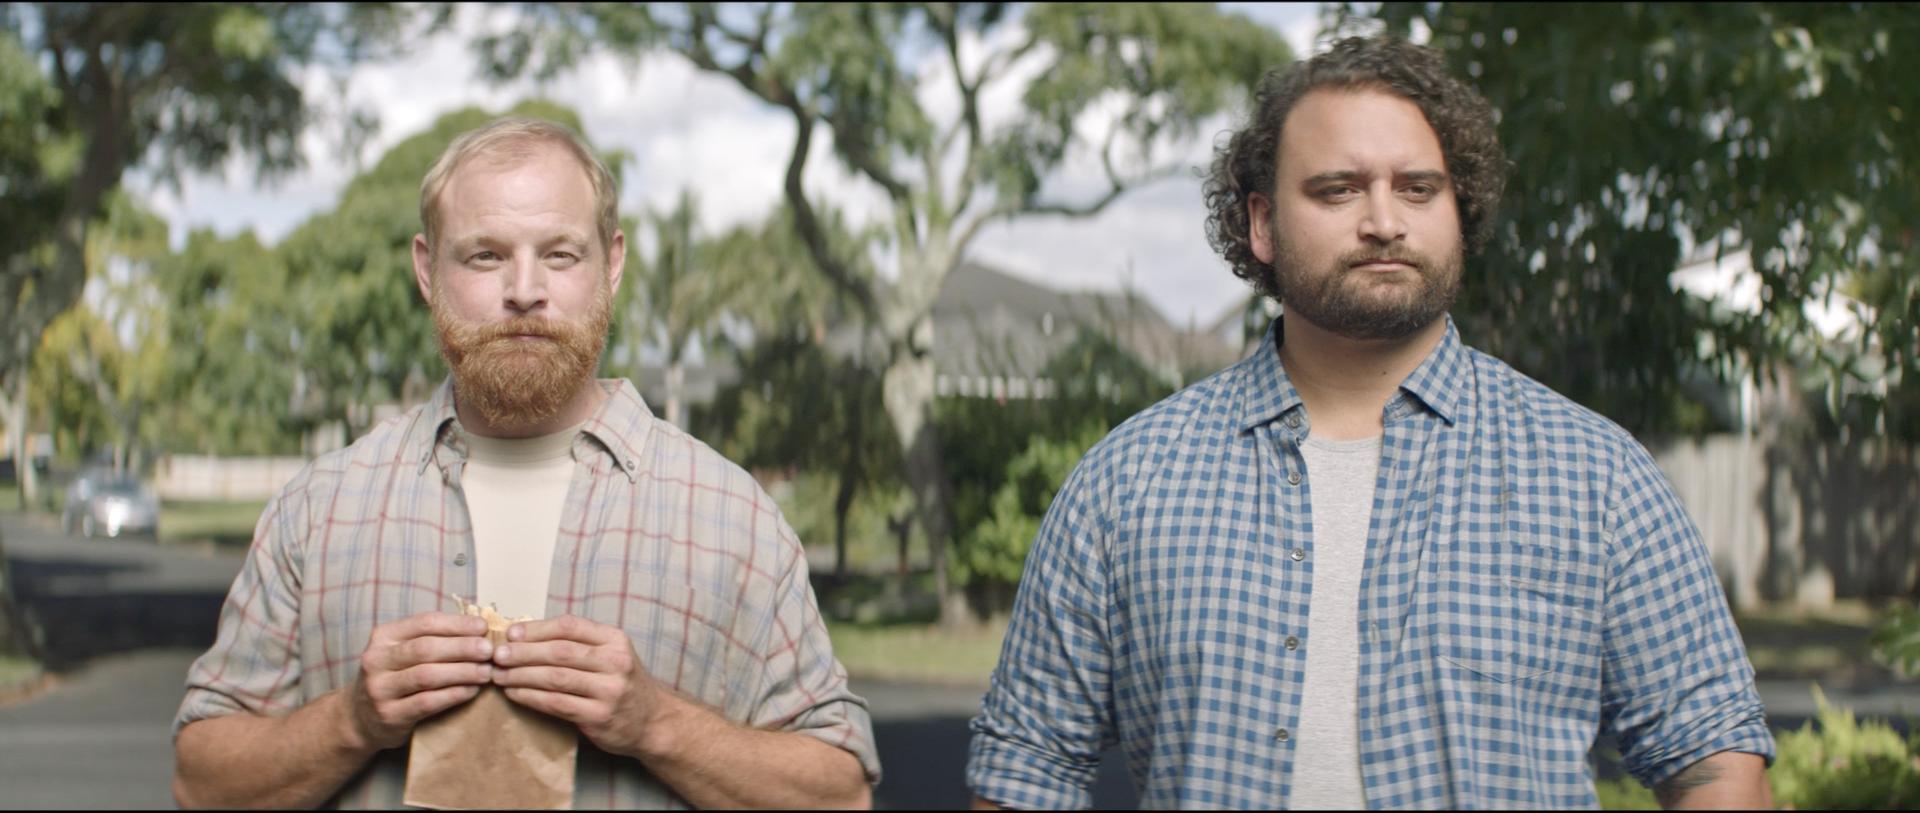 Toyota Hilux Reunites Mates for Quirky Quiet Adventures TV Spots by Saatchi & Saatchi